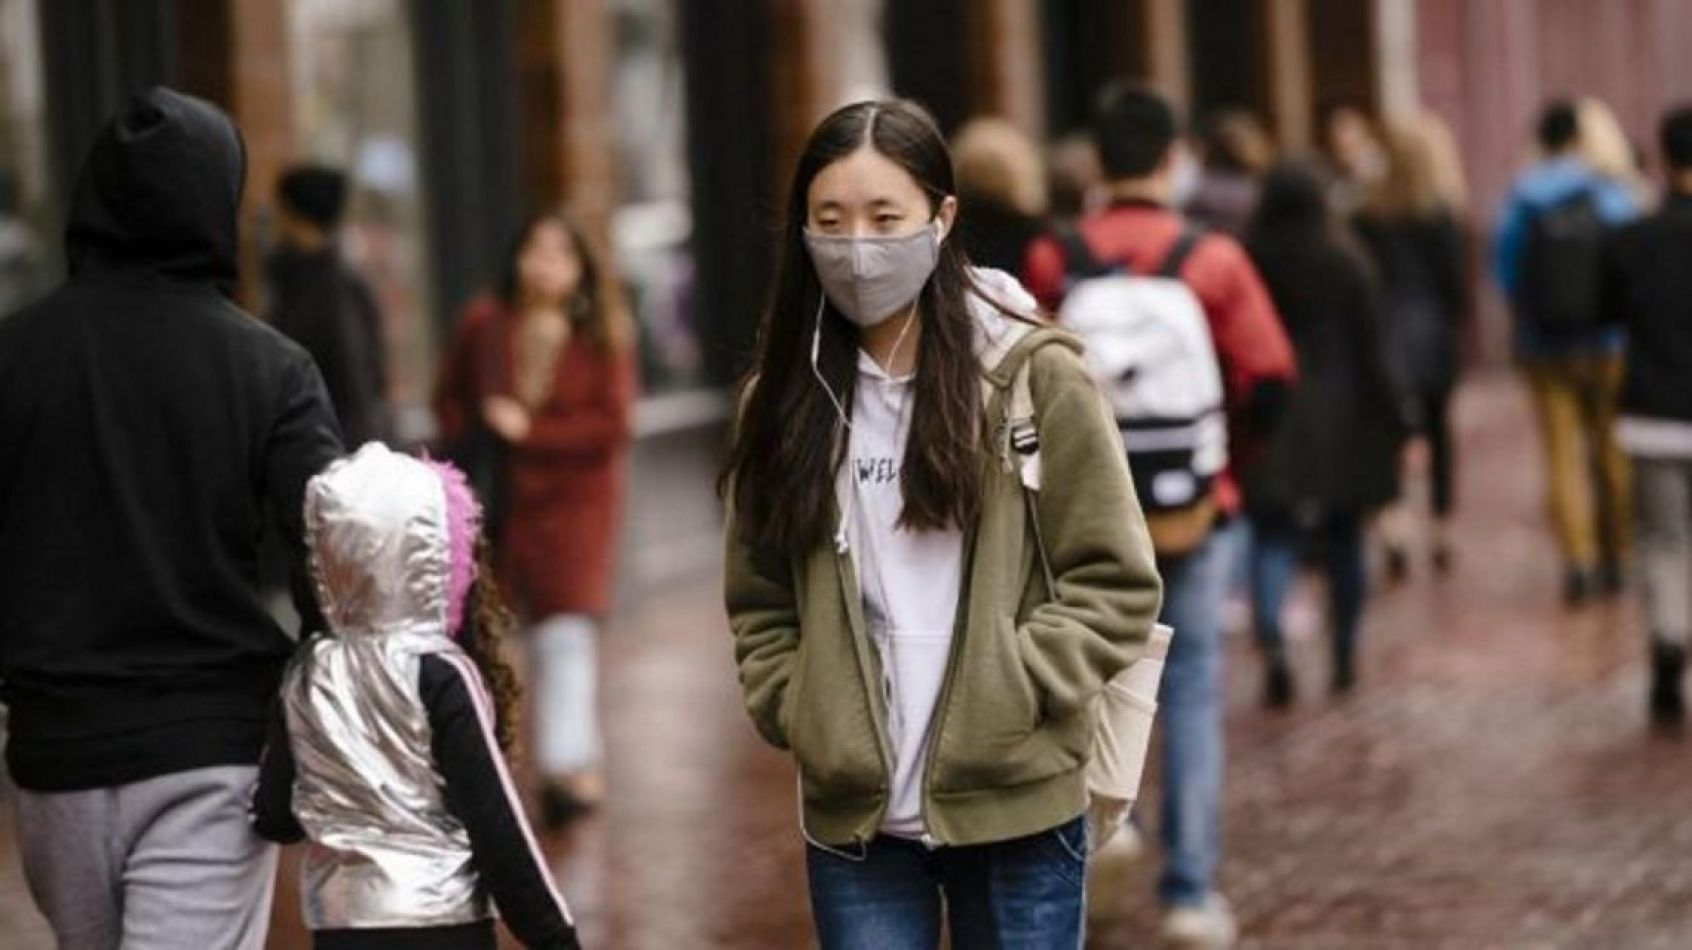 Primer muerto en Francia por coronavirus: se trata de un turista chino